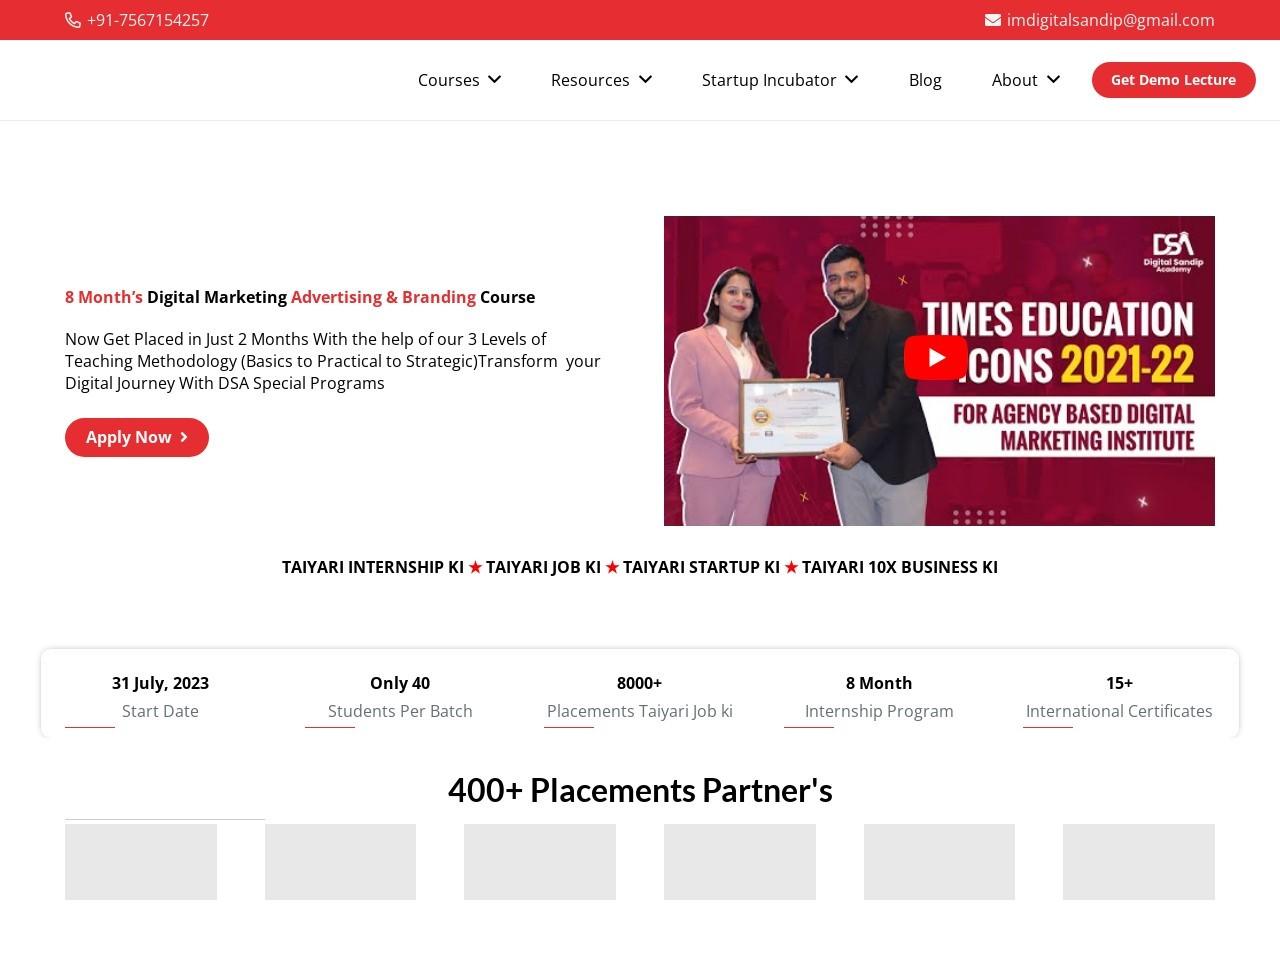 Content Marketing Course by Digital Sandip